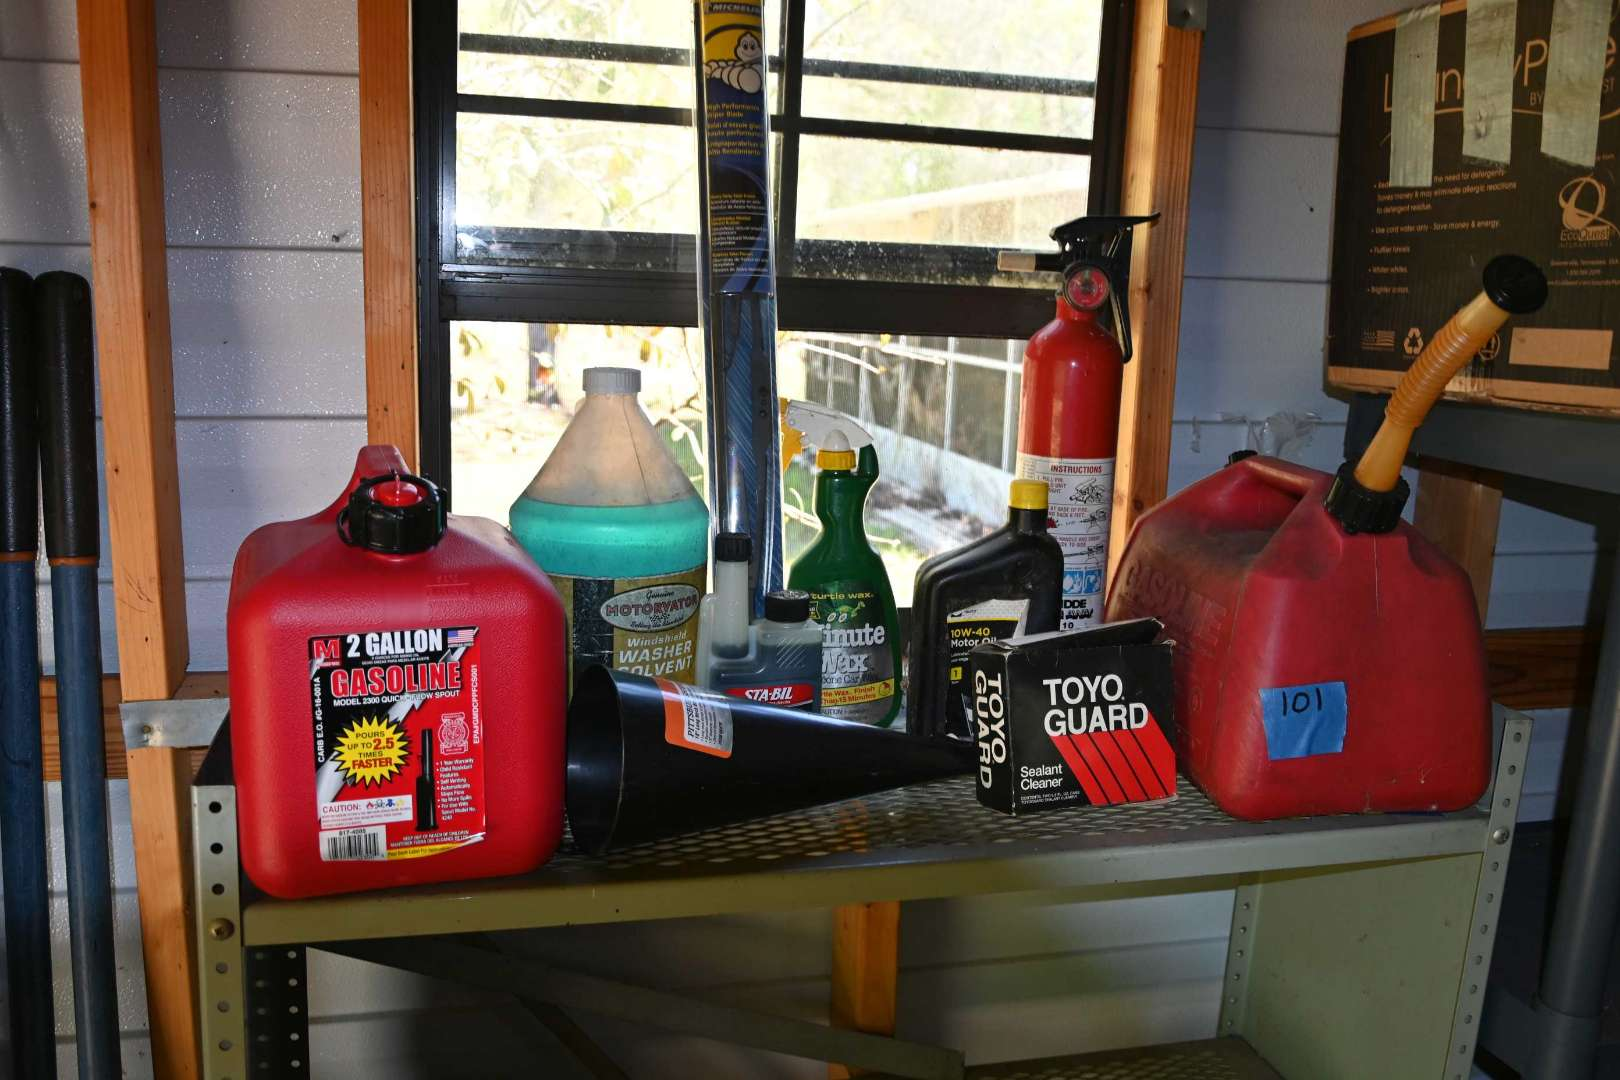 Lot # 101 Contents of shelf & fuel cans